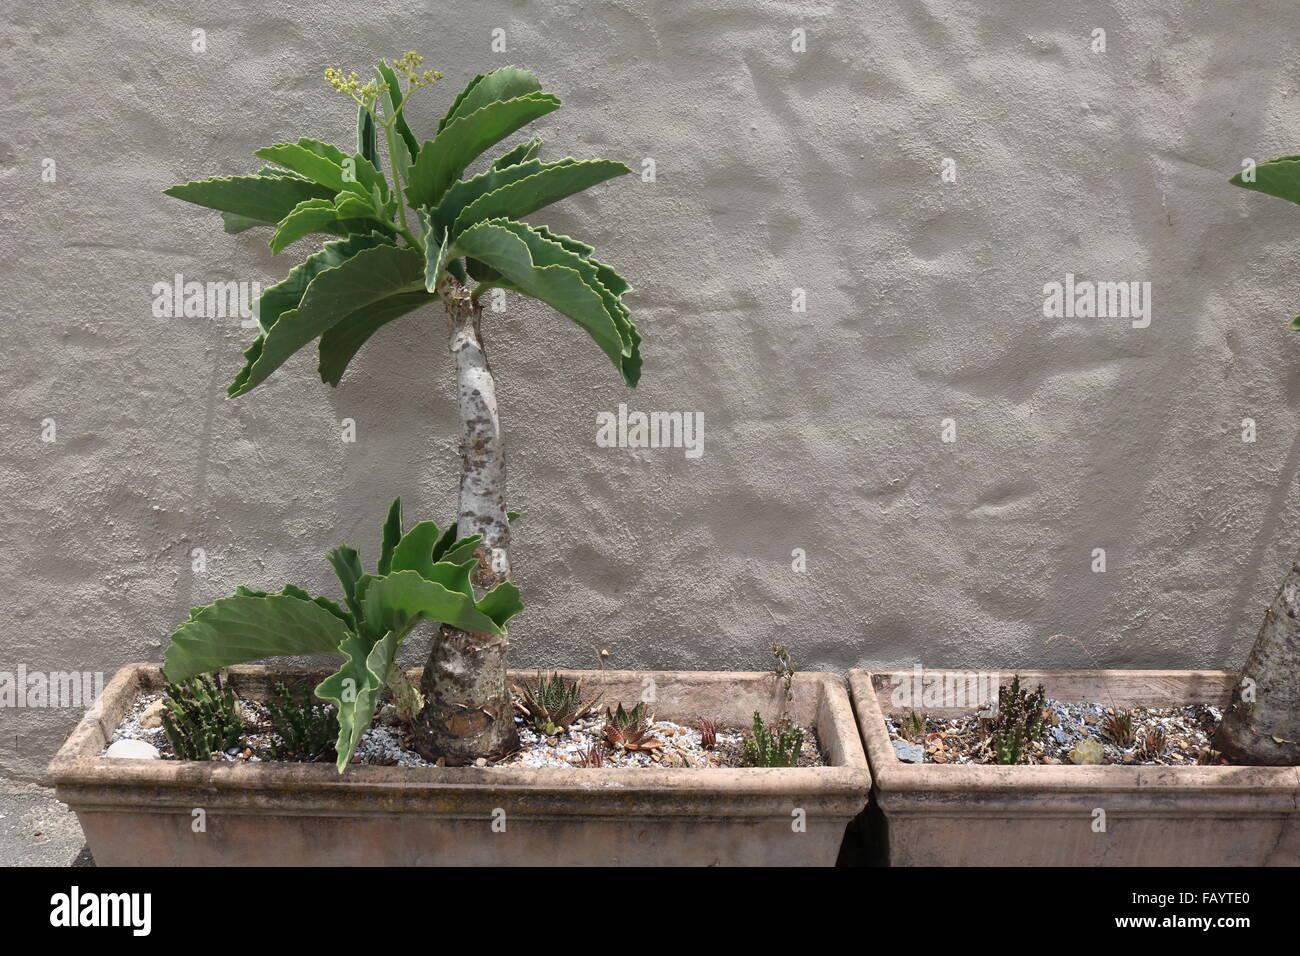 Cyphostemma juttae (Namibian grape) indigenous South African succulent - Stock Image